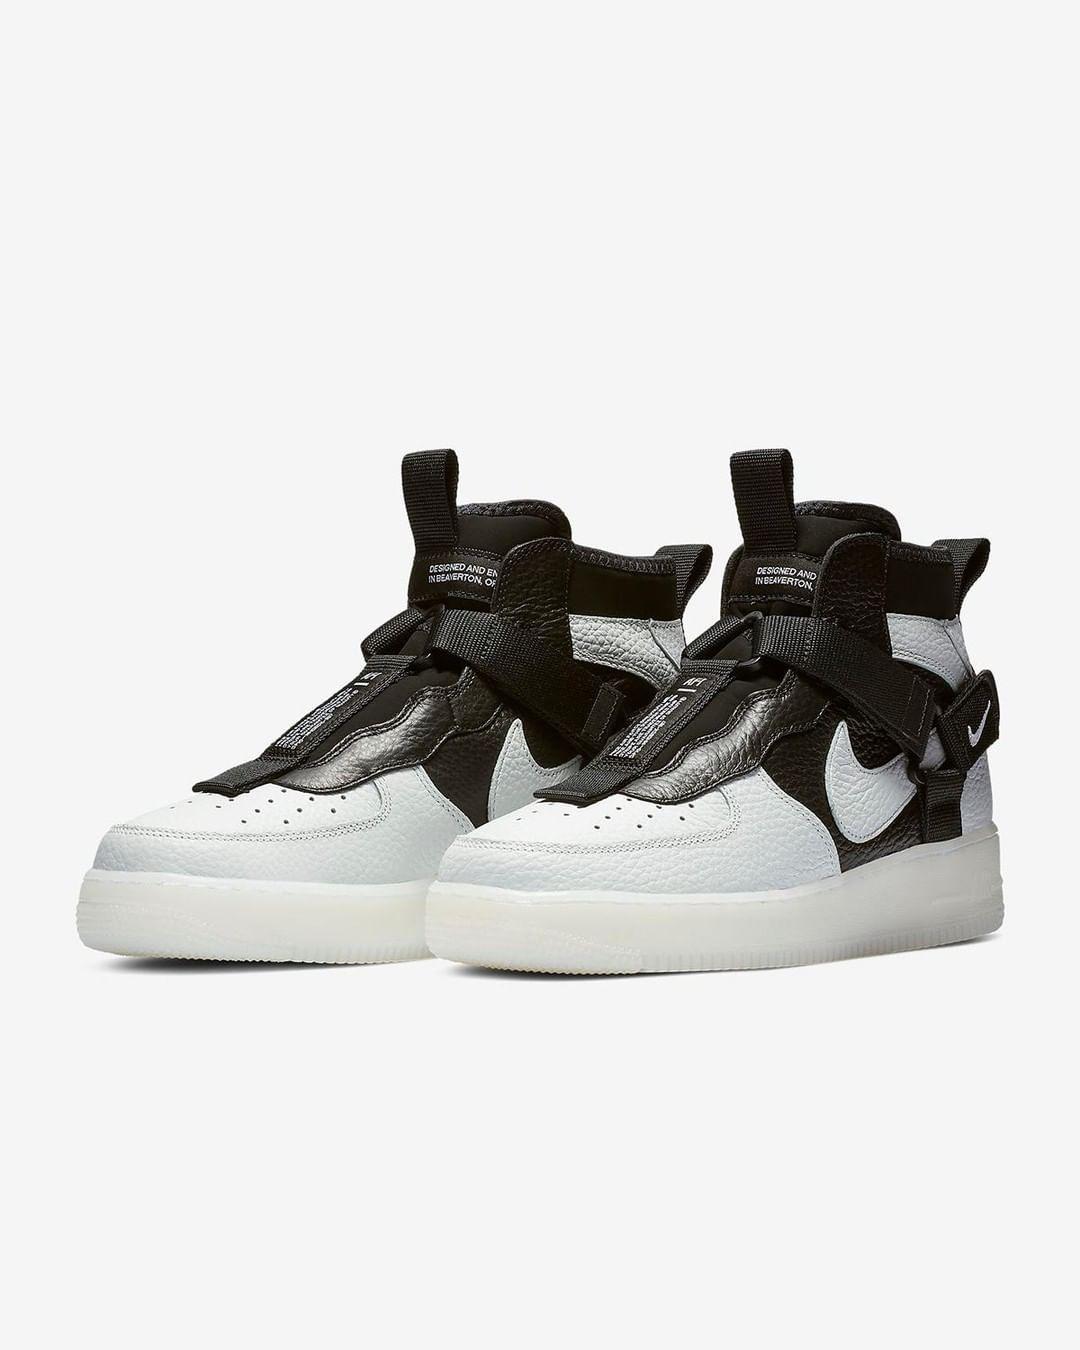 Nike air force, Shoes mens, Mens nike shoes